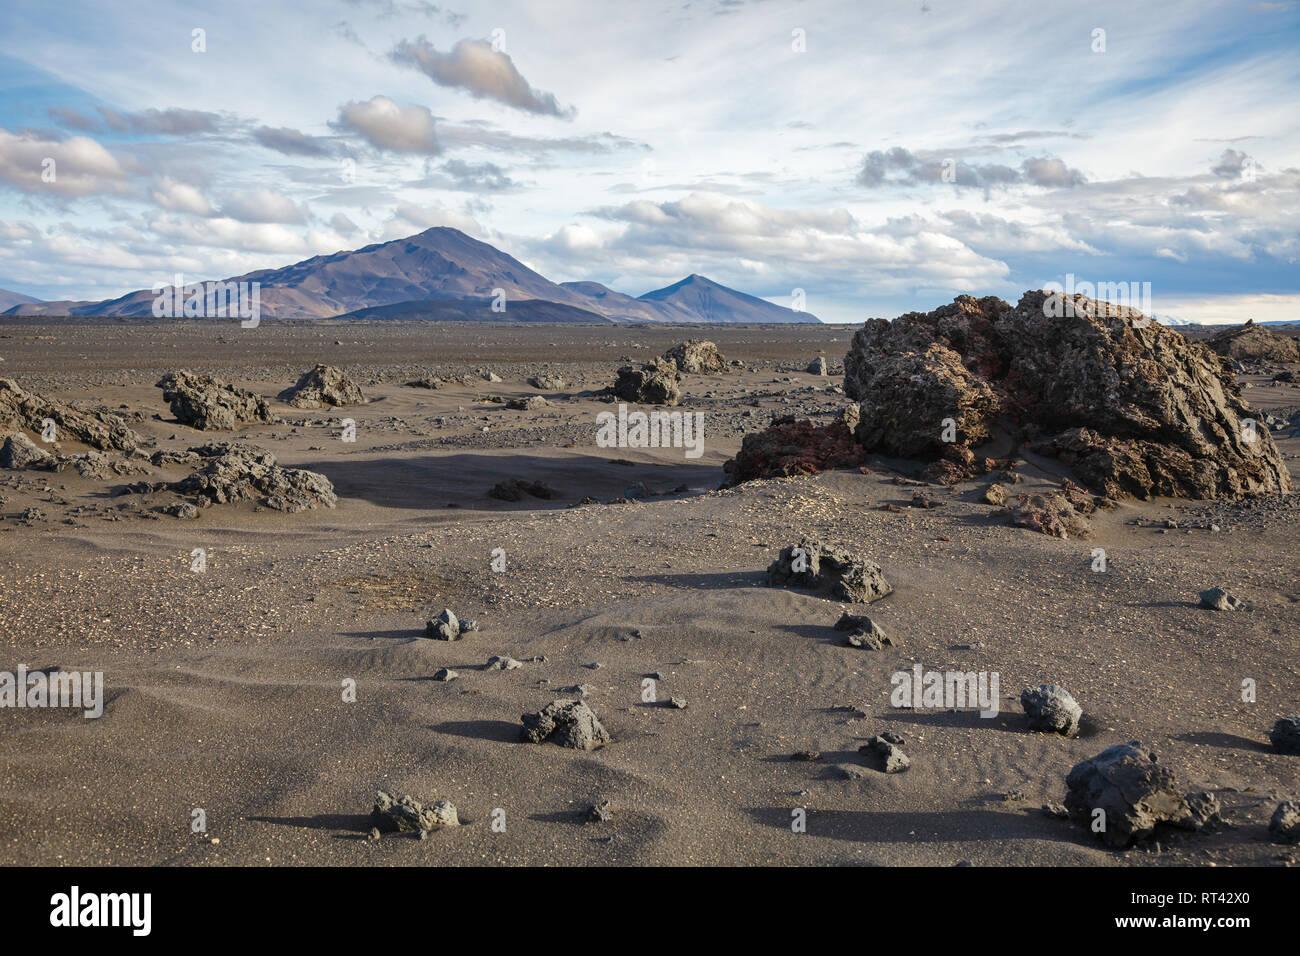 Desert sands volcanic ash and lava formations at Ódáðahraun (Lava of Evil Deeds), the largegst Icelandic lava field, Highlands of Iceland, Scandinavia - Stock Image